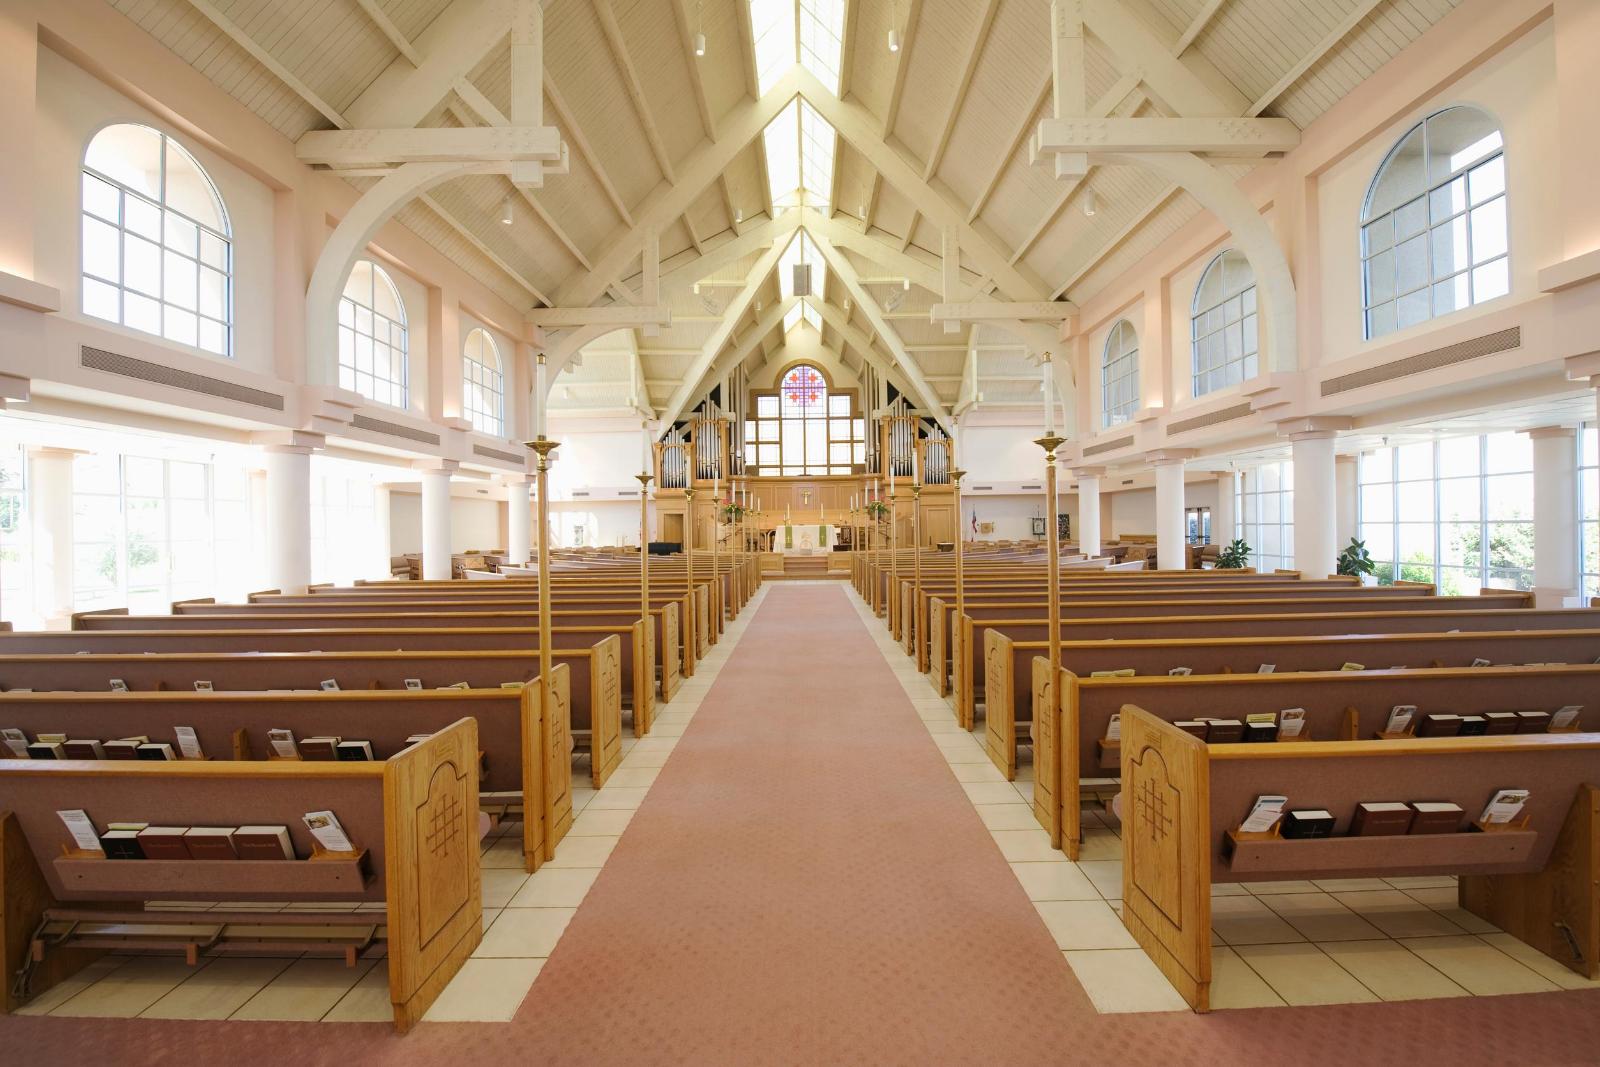 A hallway of an empty church